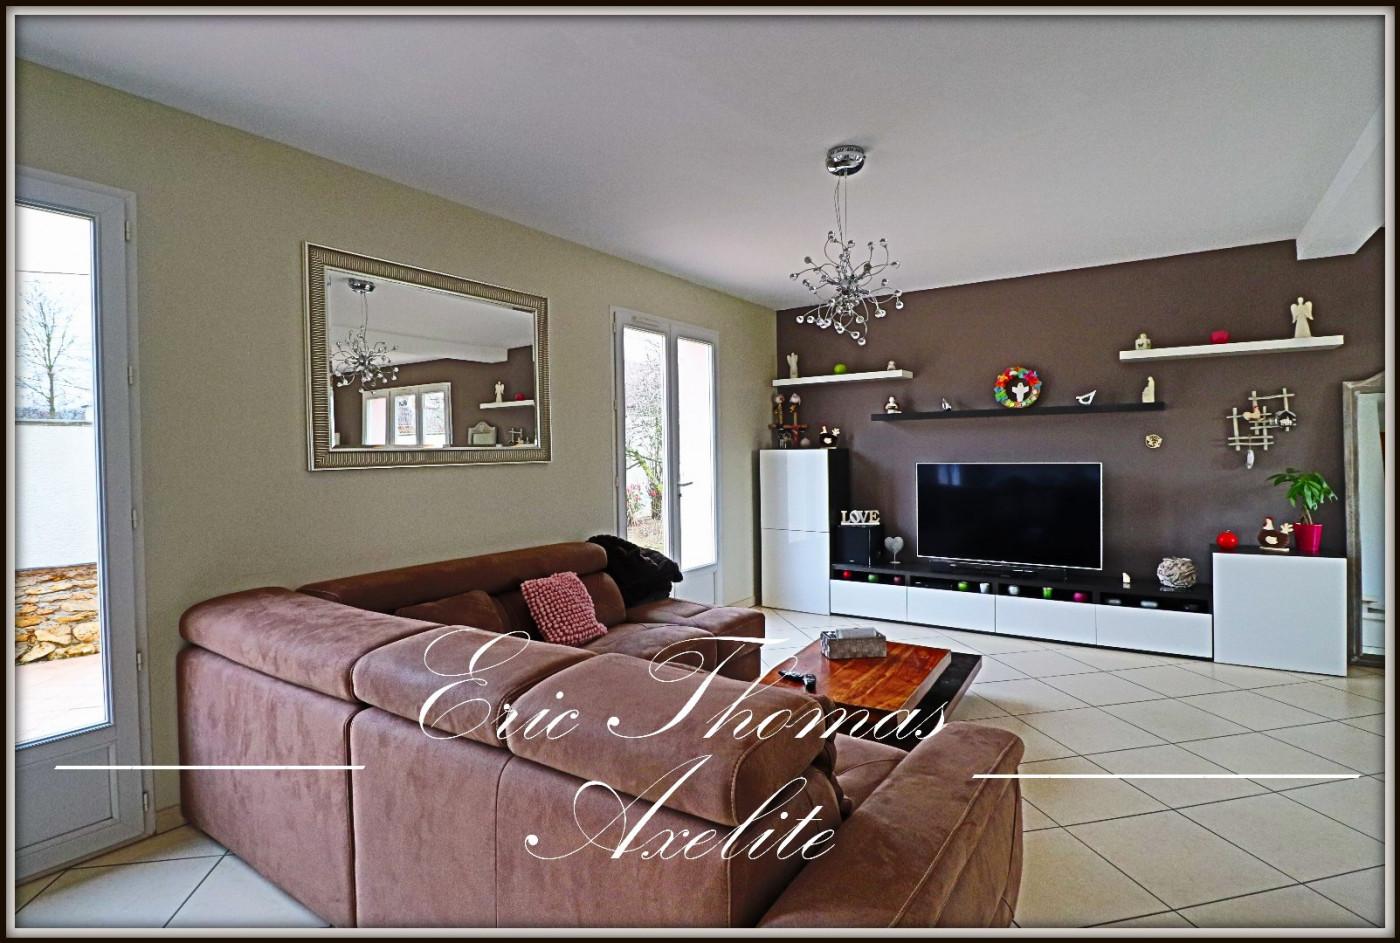 A vendre  Liverdy En Brie   Réf 777922543 - Axelite sas